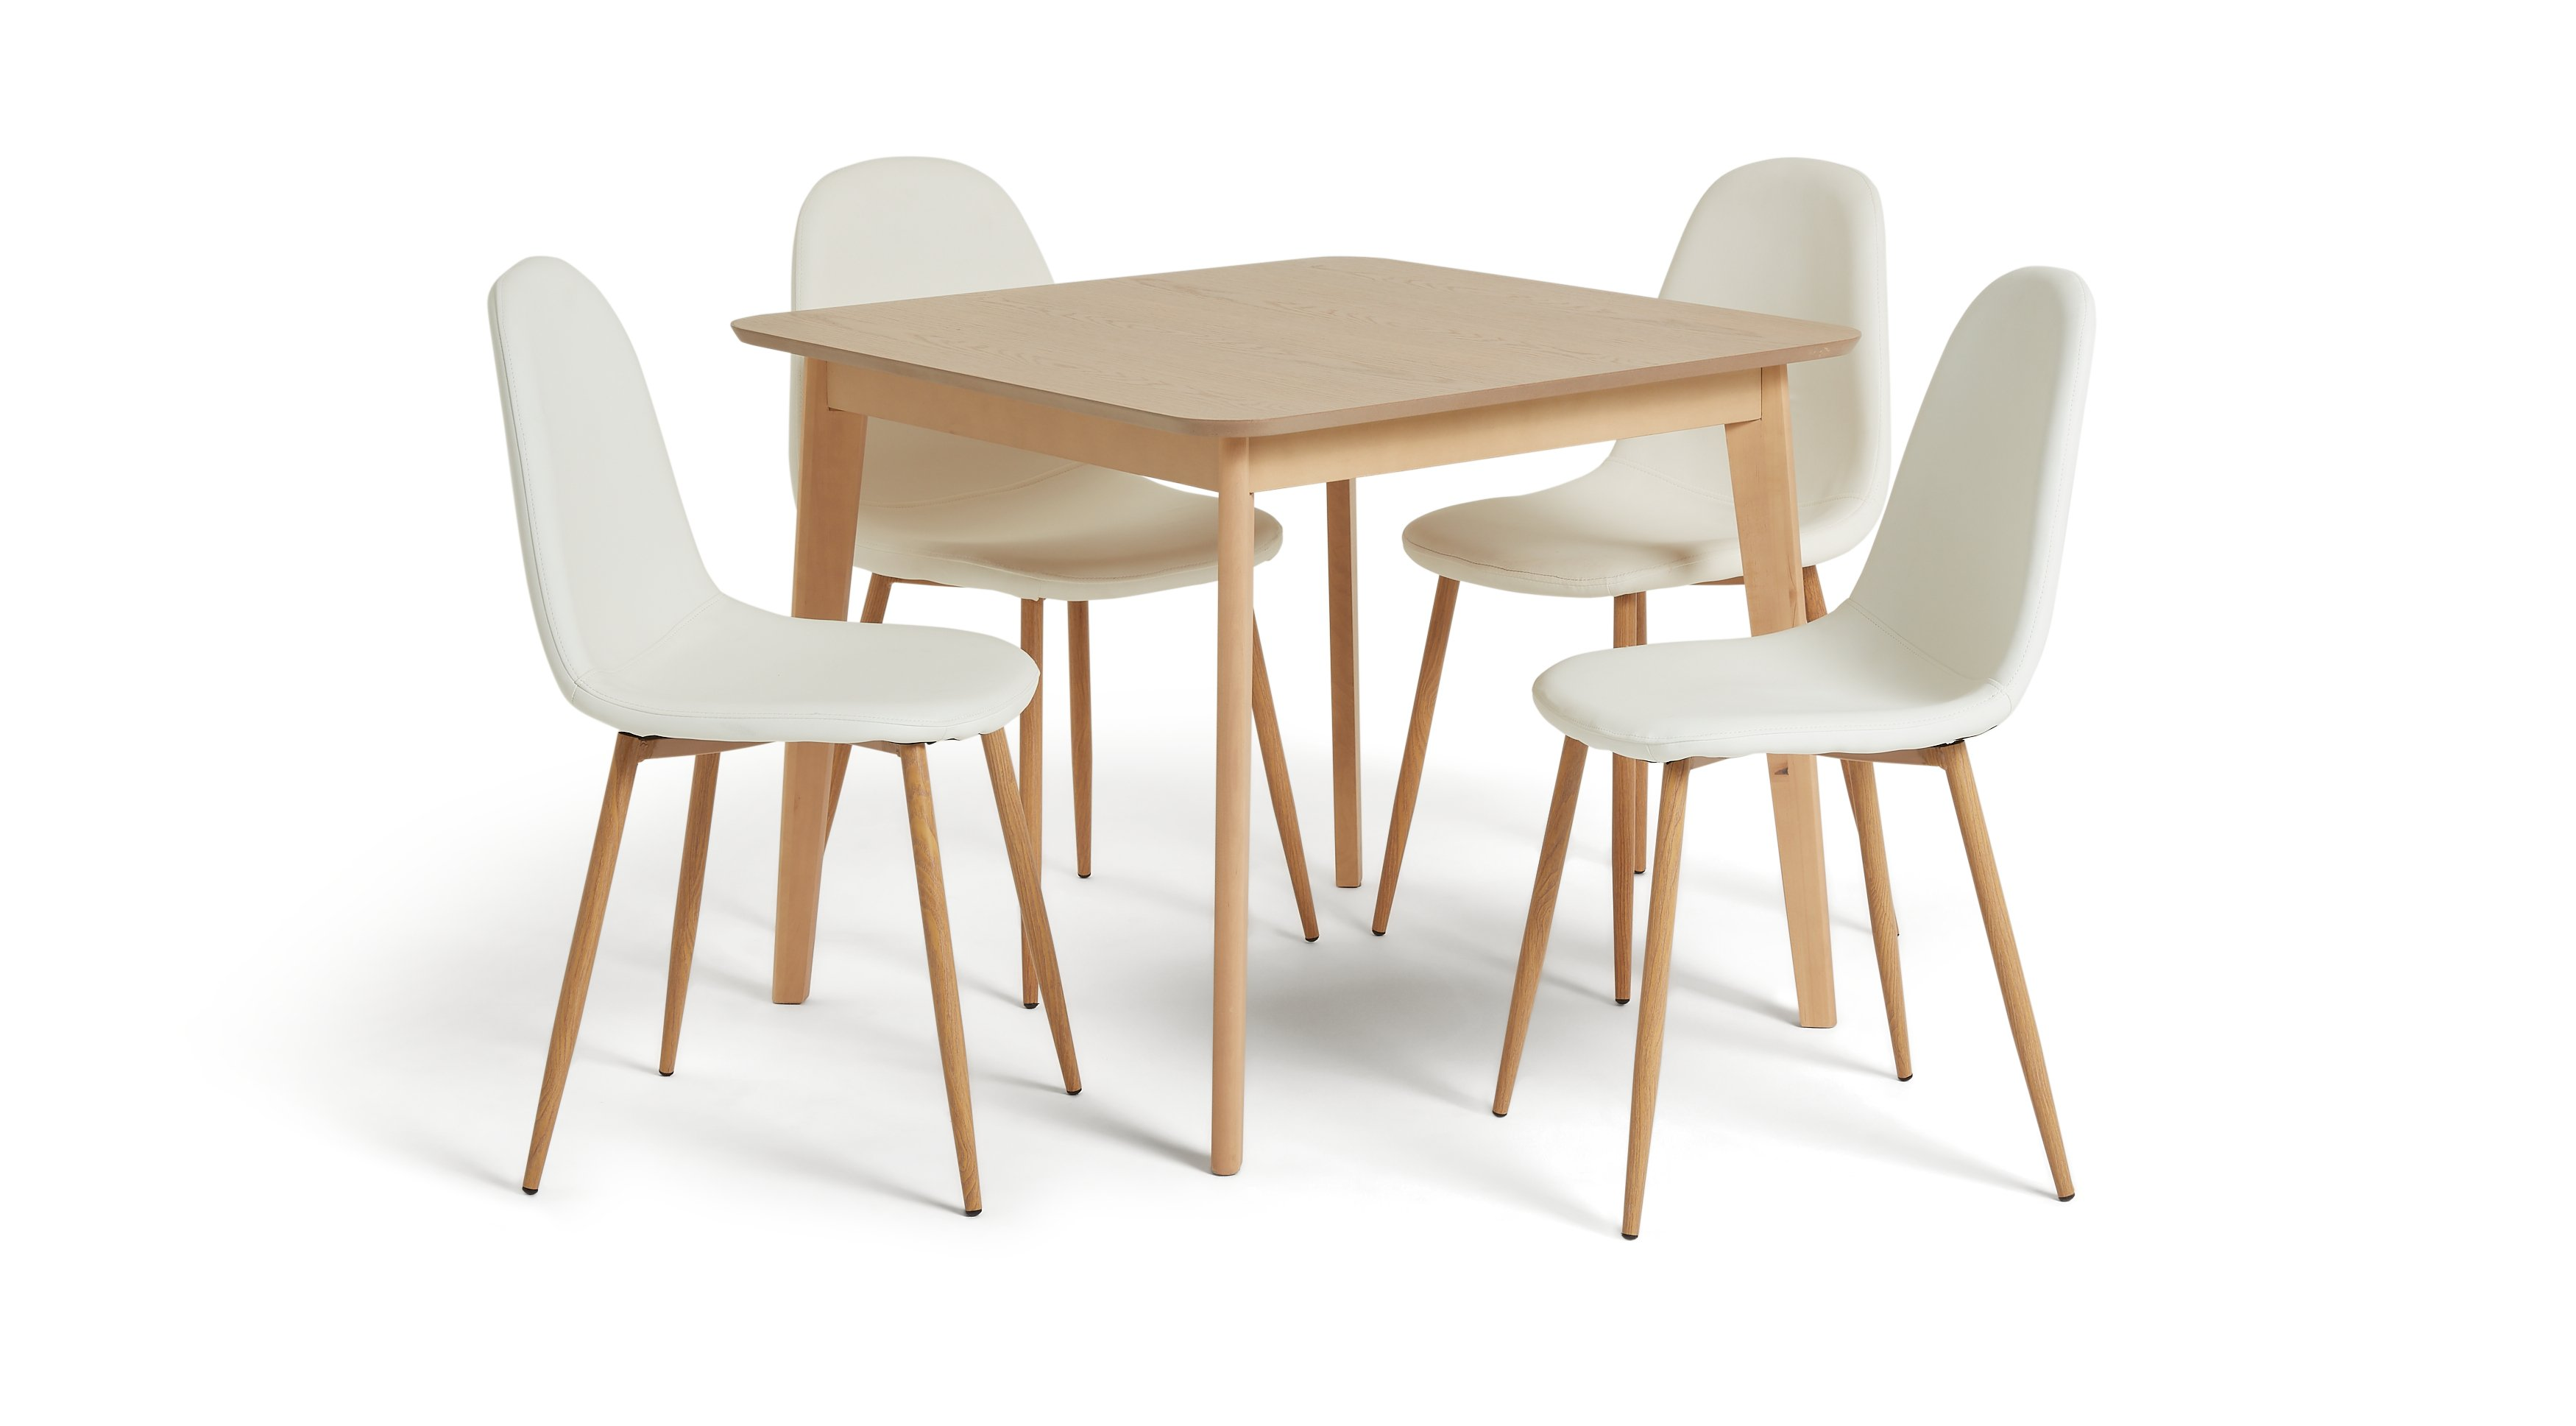 Habitat Skandi Wood Dining Table and 4 Beni White Chairs